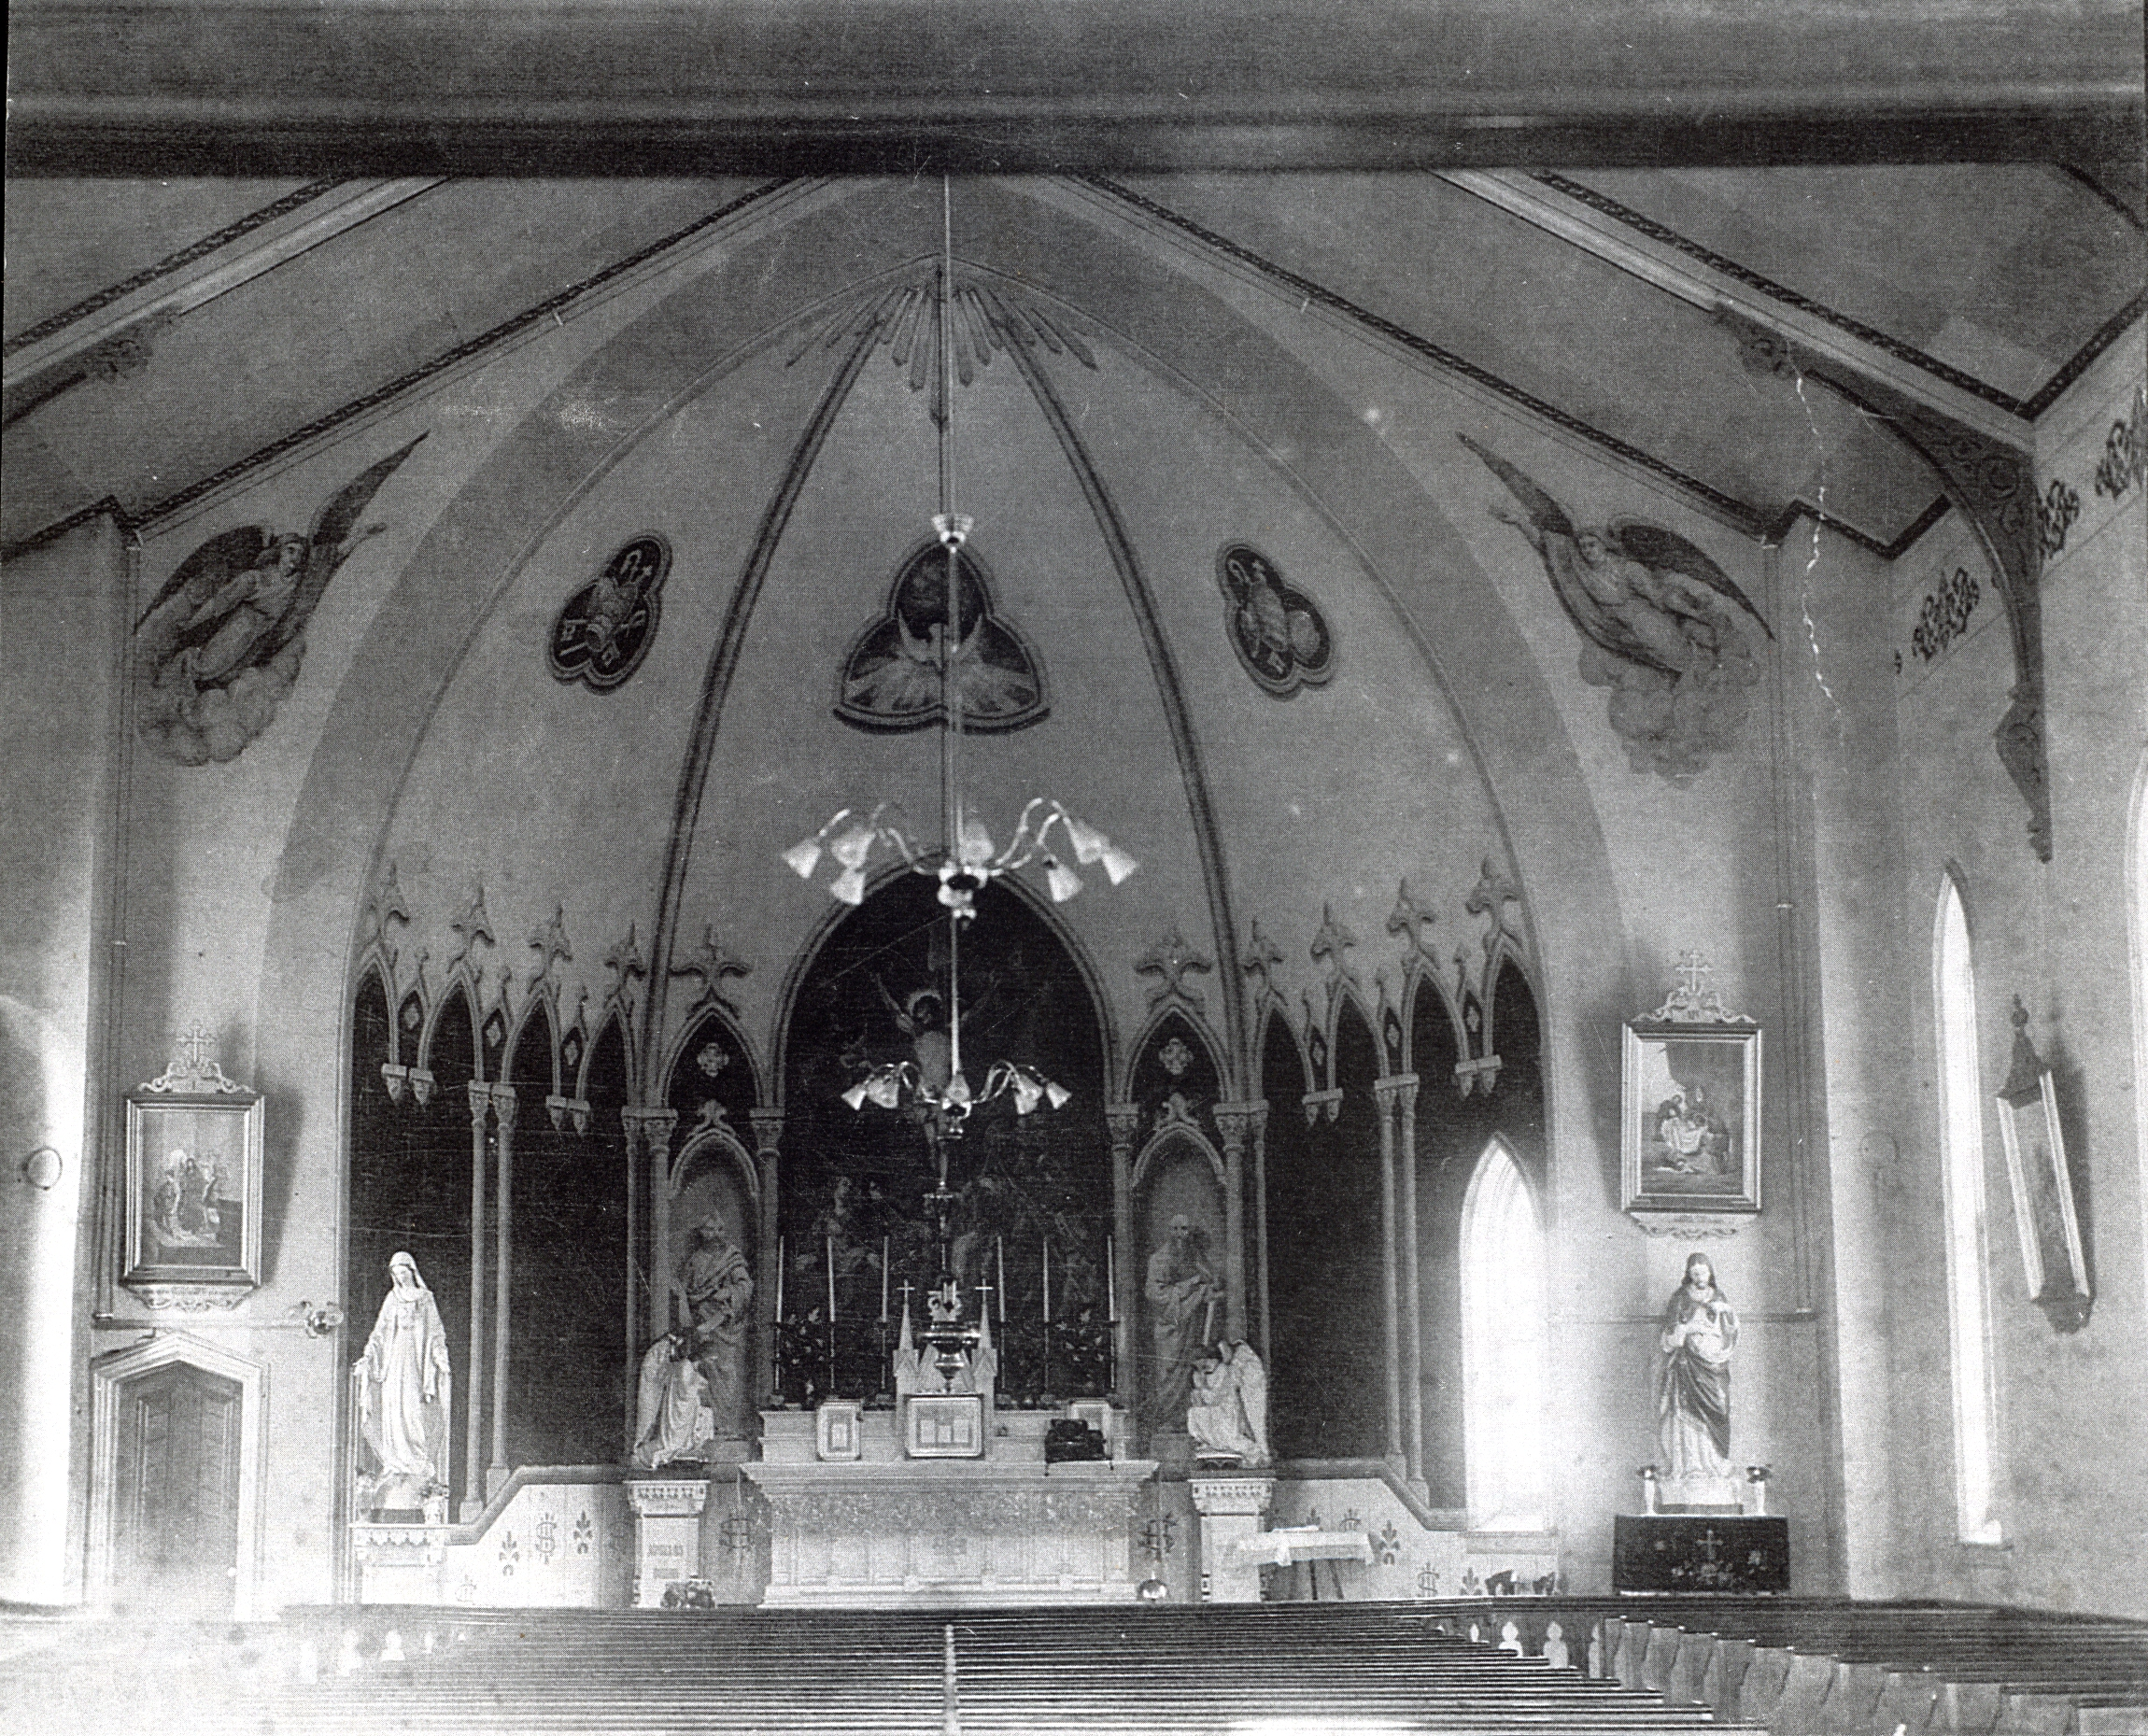 Interior of Brick church built in 1875